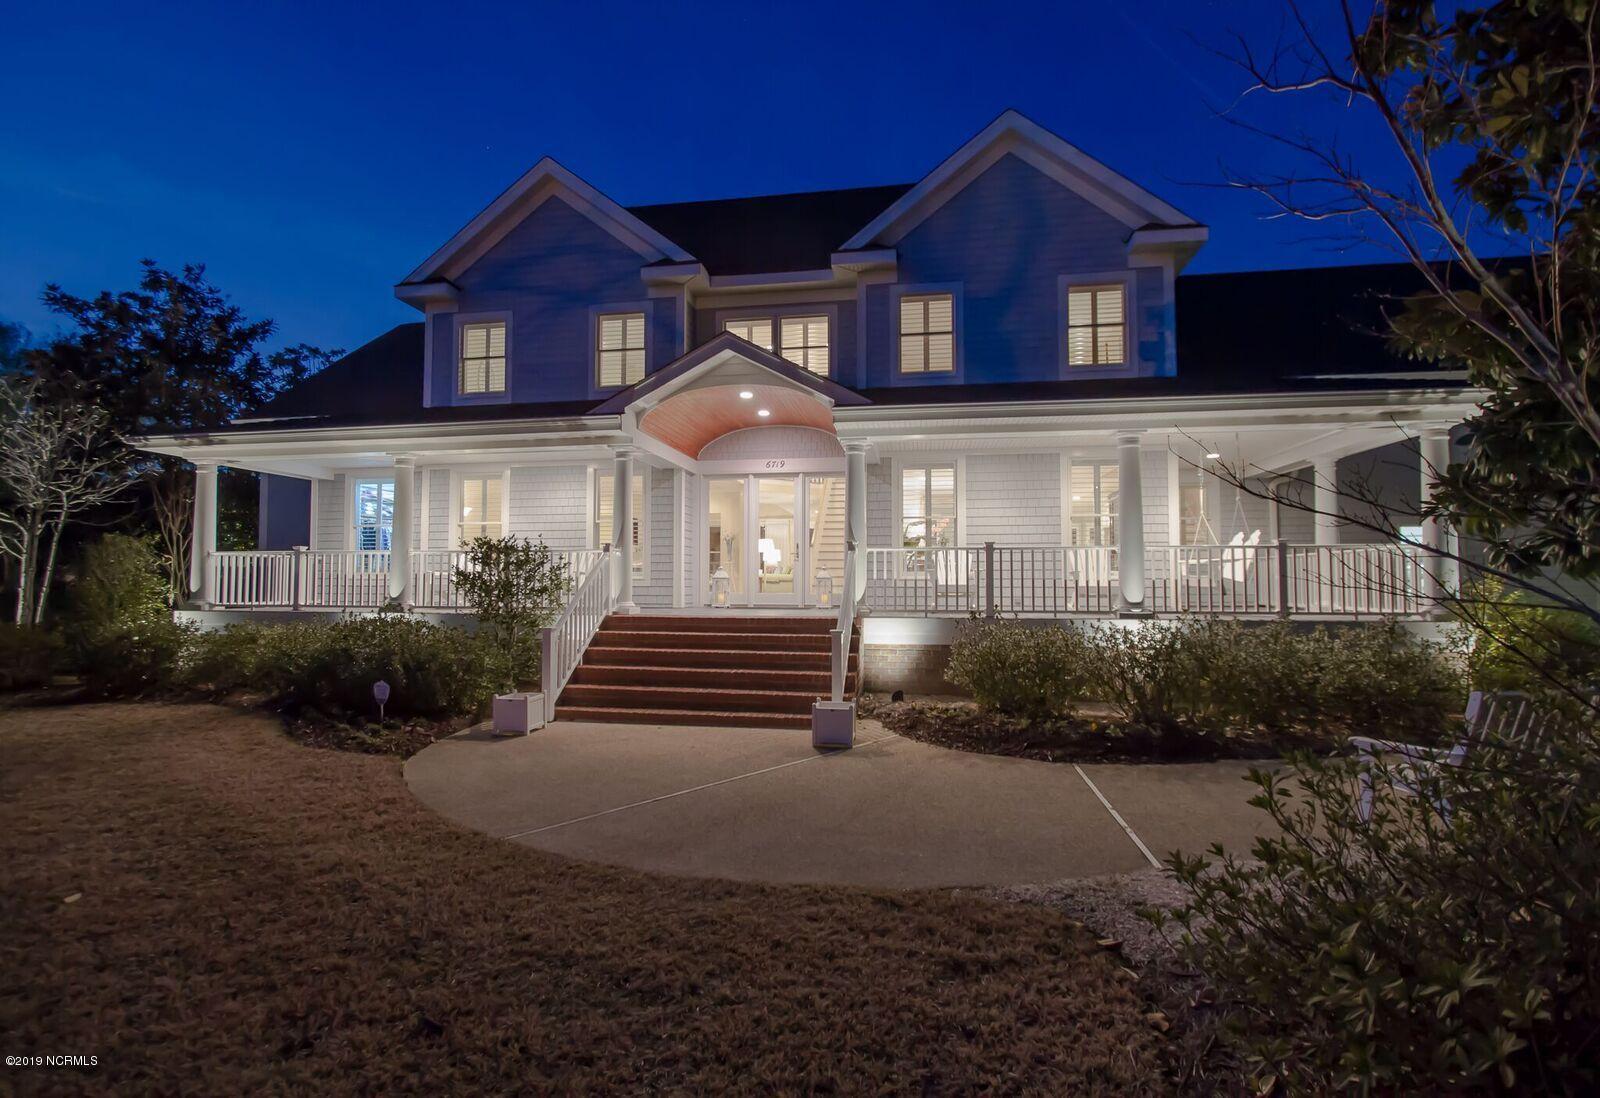 6719 Finian Drive, Wilmington, North Carolina, 5 Bedrooms Bedrooms, 11 Rooms Rooms,4 BathroomsBathrooms,Single family residence,For sale,Finian,100120118